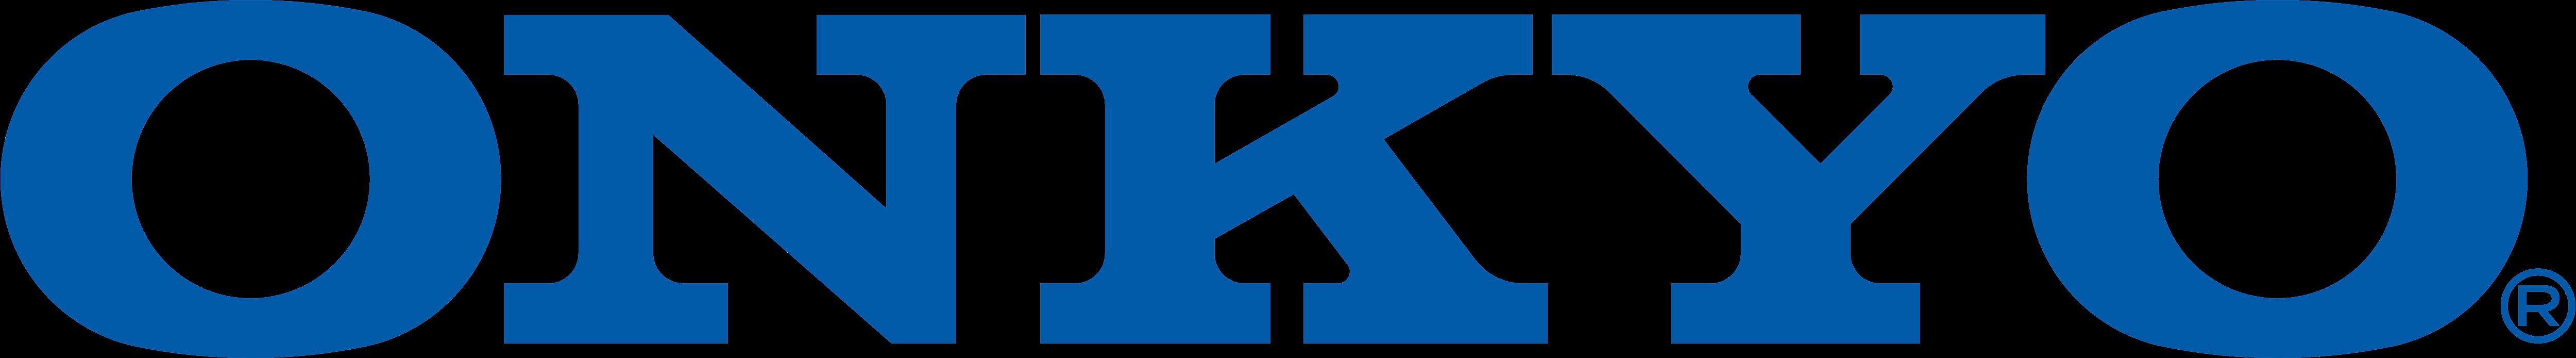 Bluetooth 4.0 Logo Png